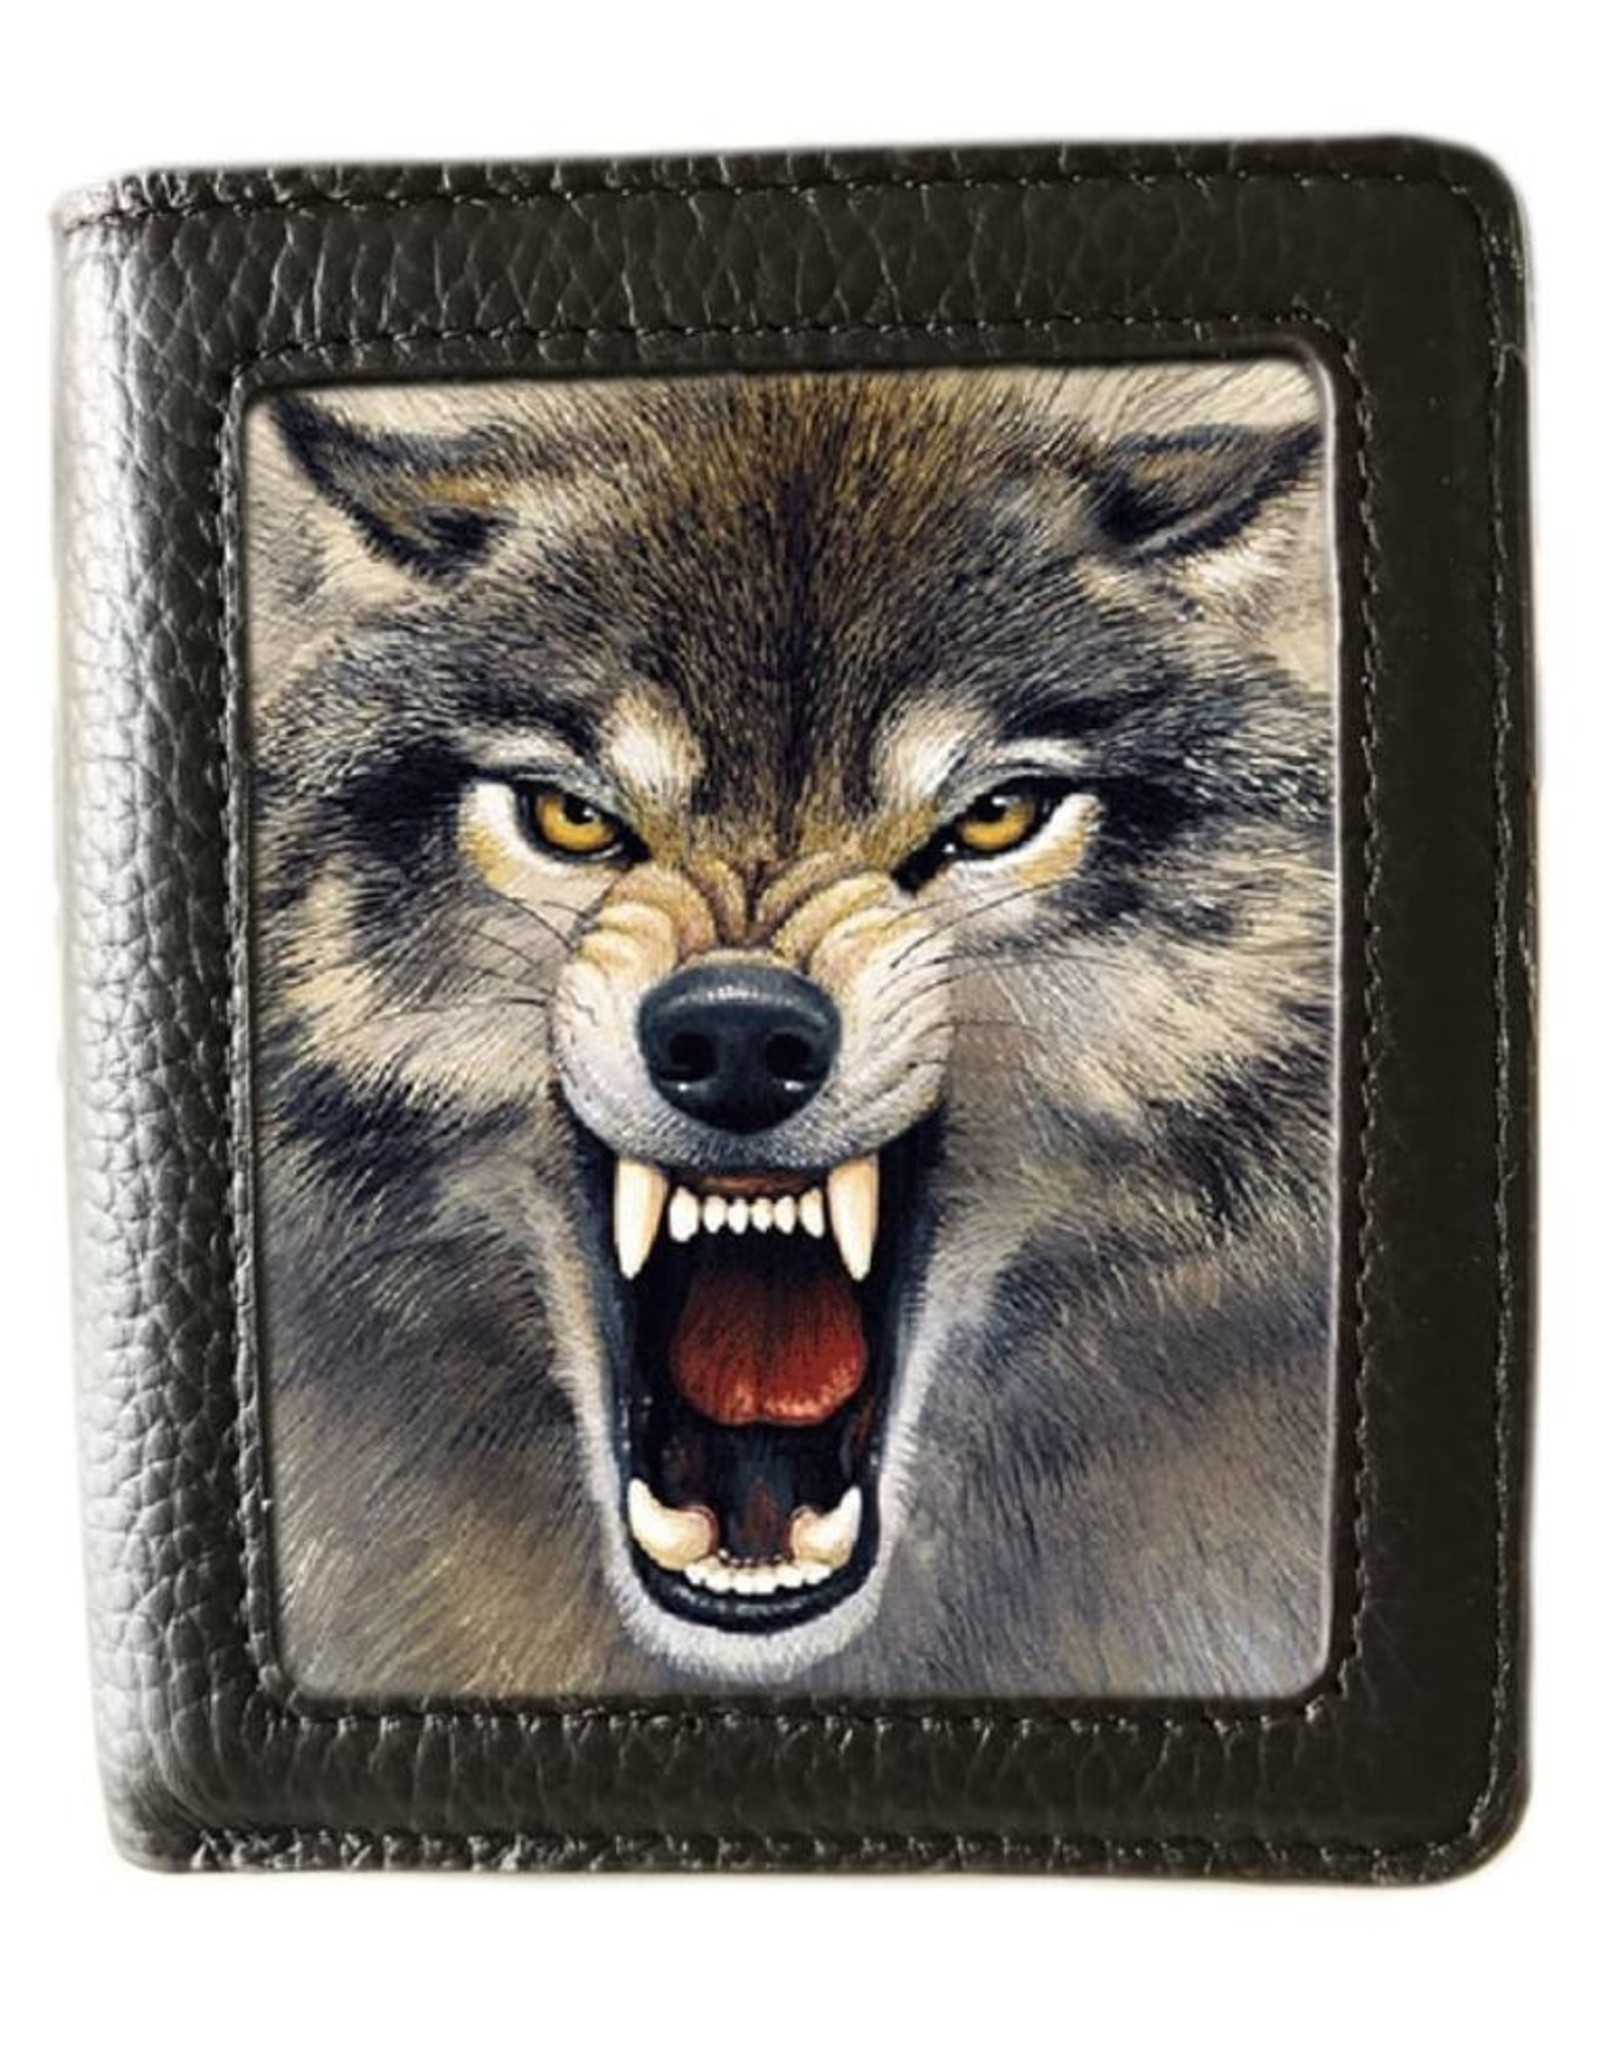 Caszmy 3D portemonnees - Caszmy Collection 3D  portemonnee Wolf